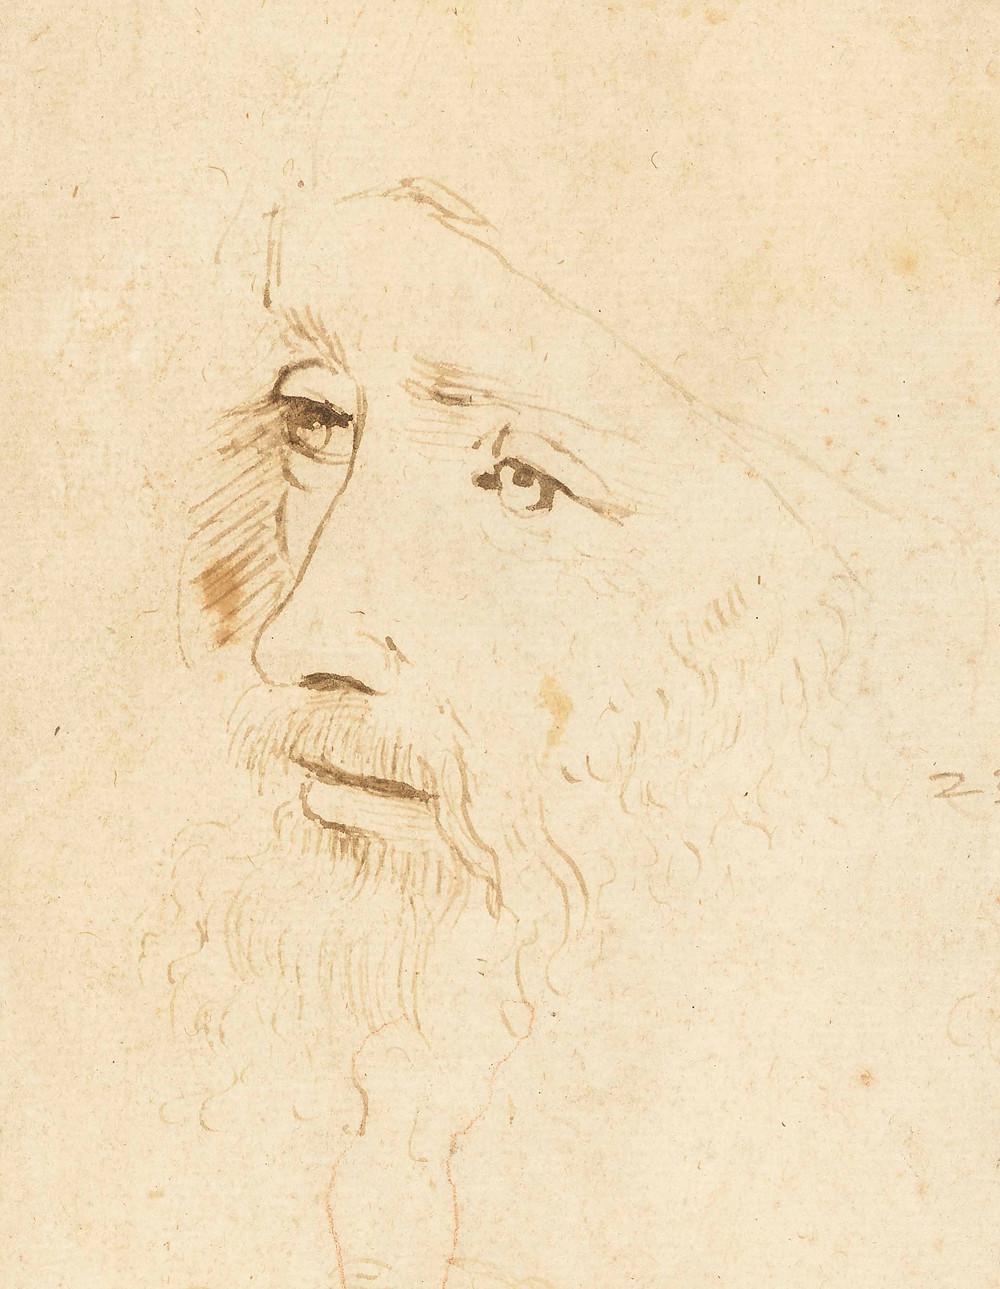 A sketch of Leonardo da Vinci, c.1517-18, by an assistant of Leonardo. Royal Collection Trust / (c) Her Majesty Queen Elizabeth II 2019